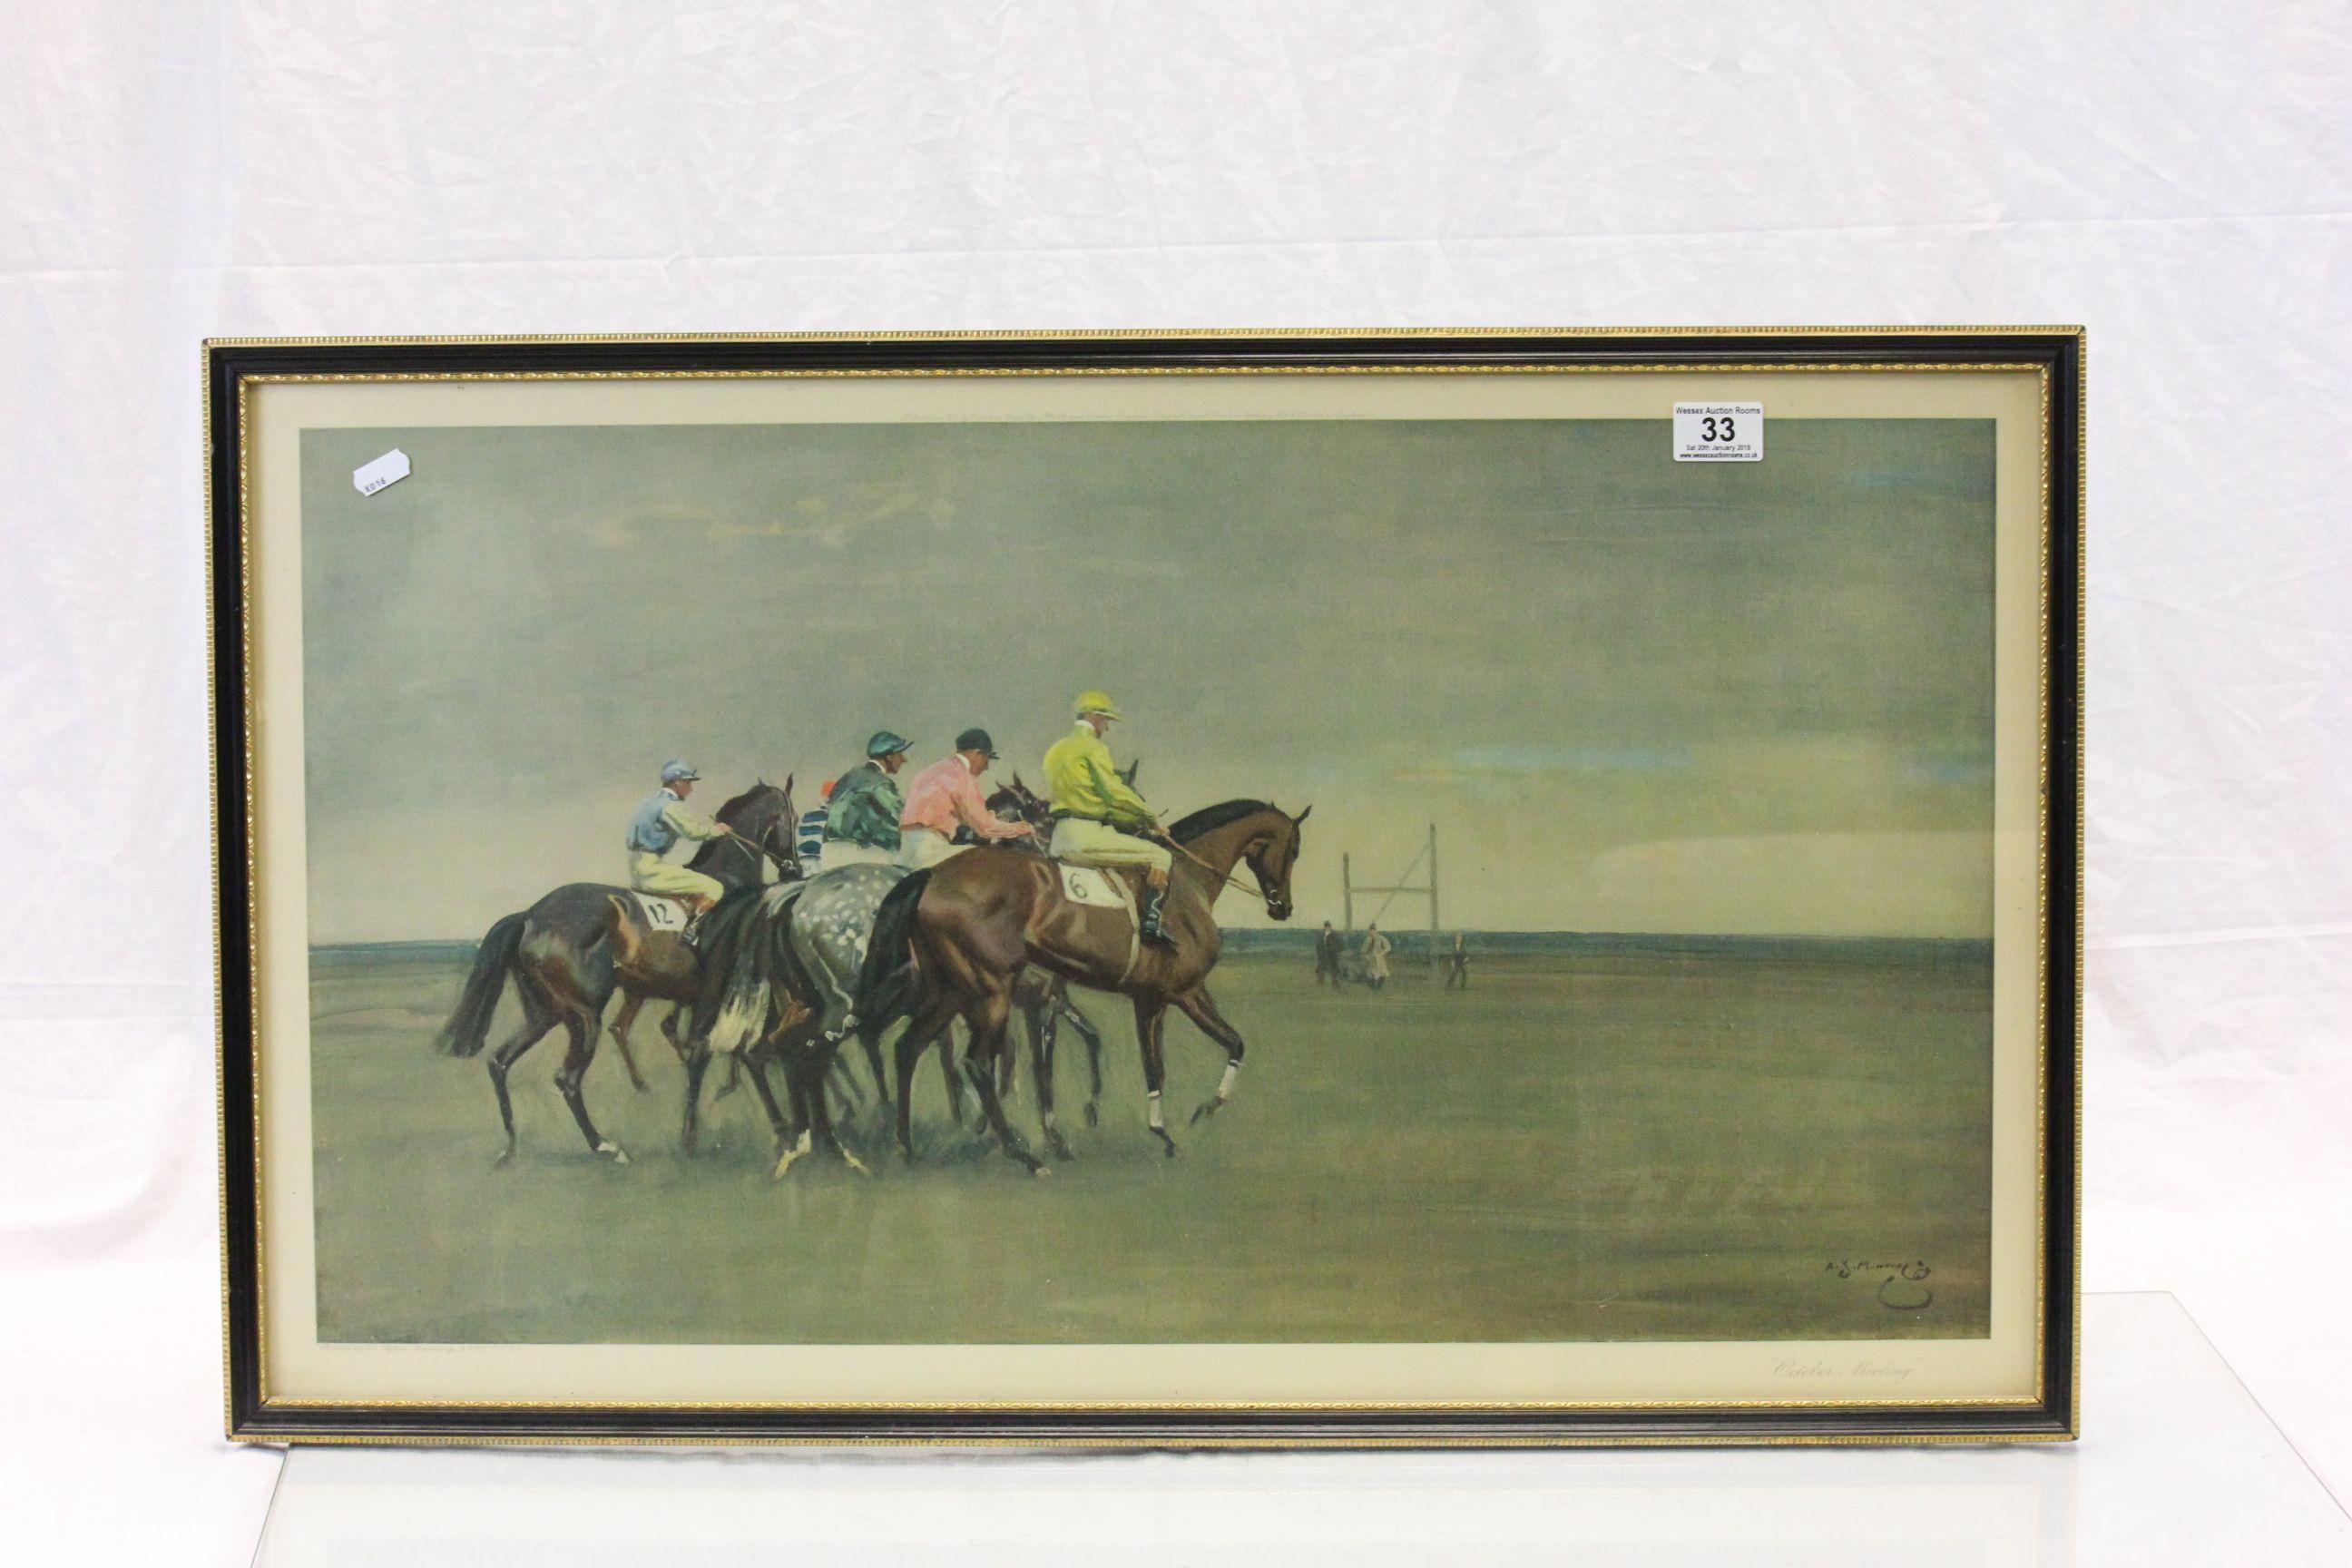 Lot 33 - Framed & glazed 1950's horse racing print